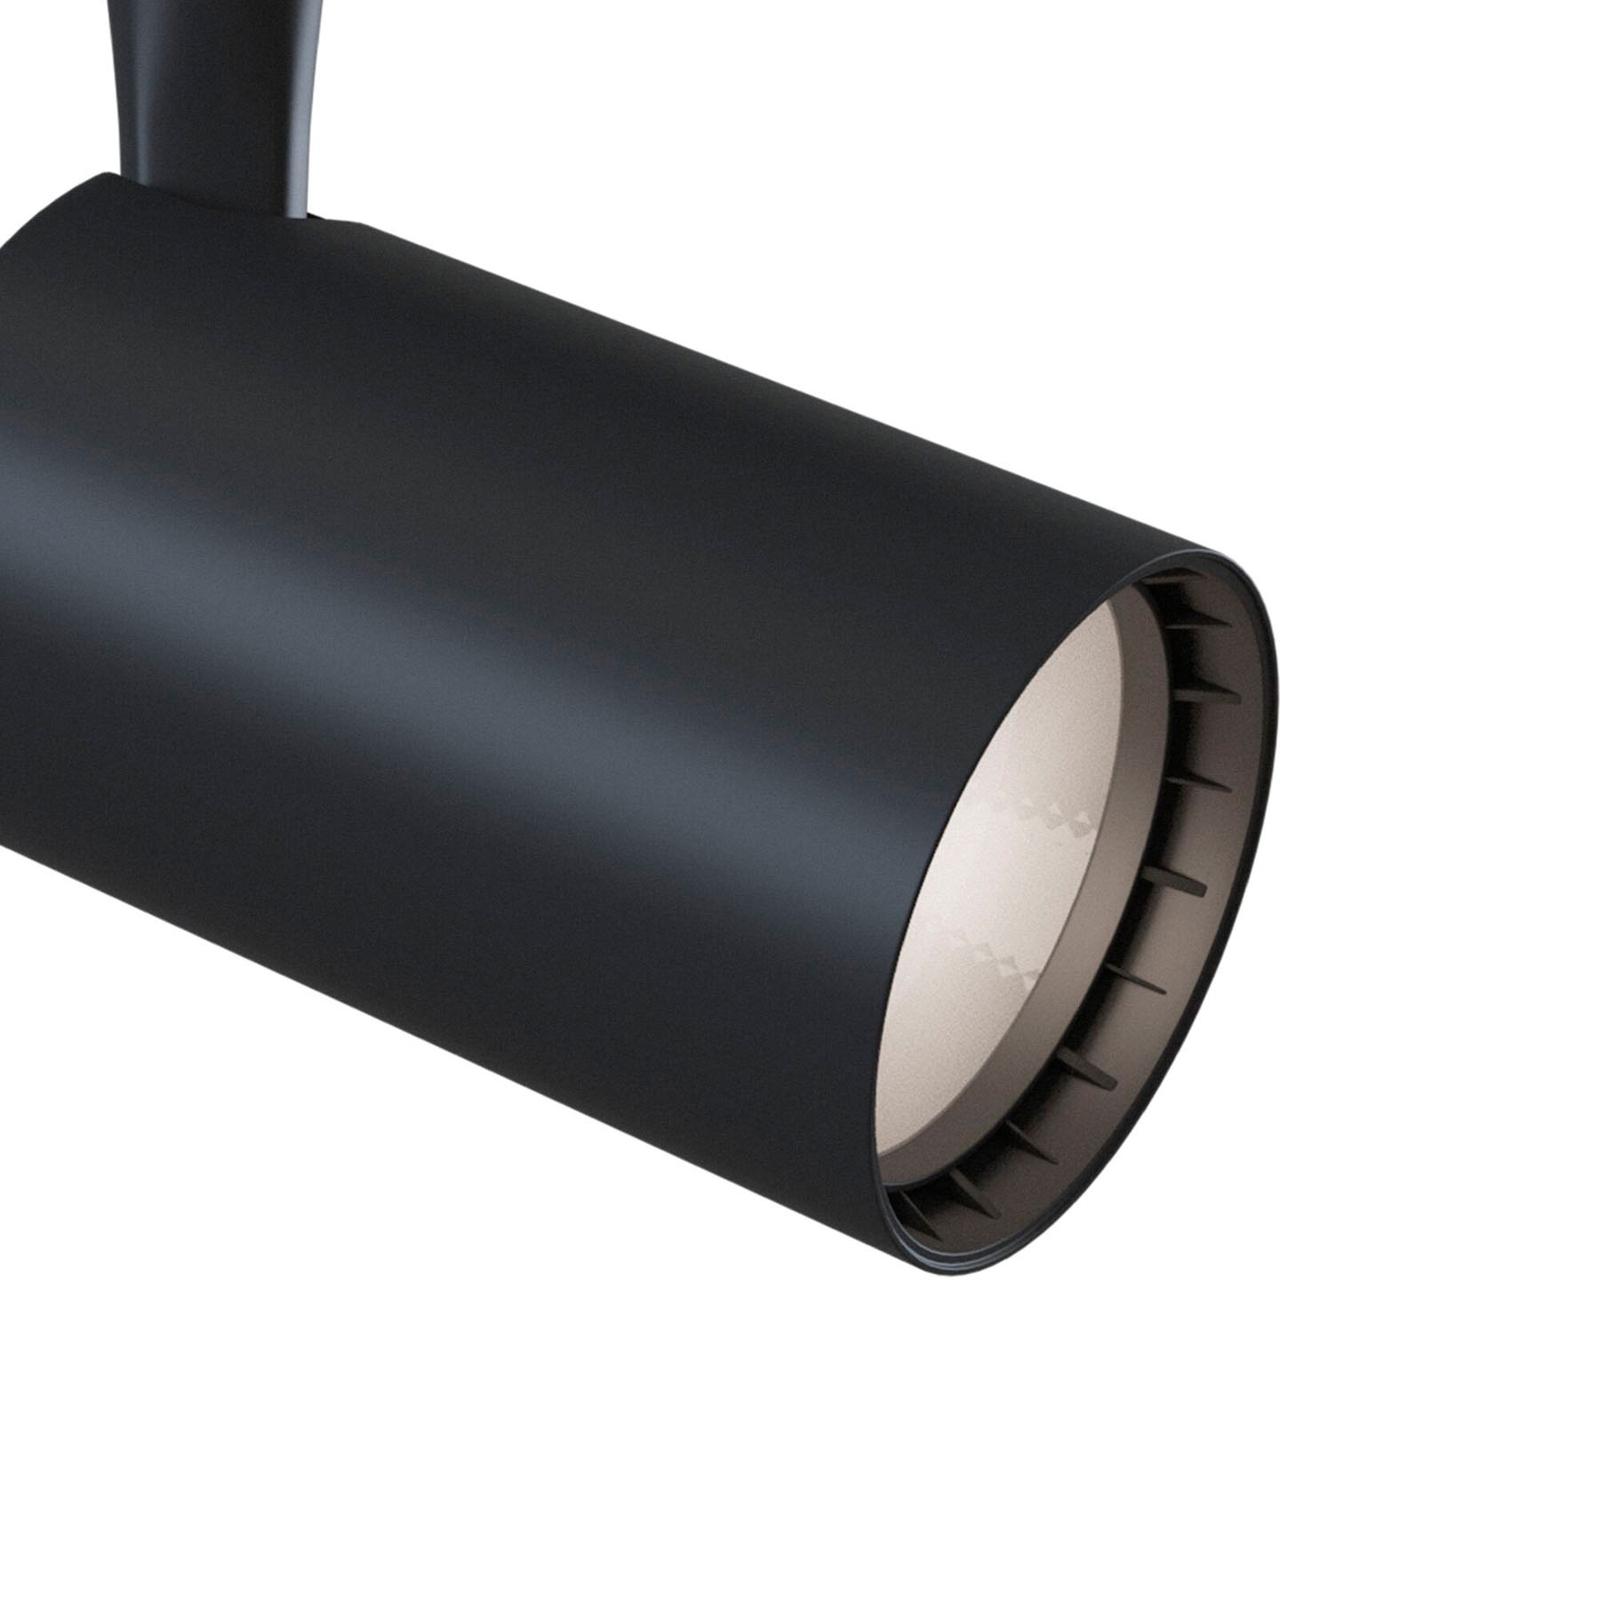 1-vaihe-spotti Track LED 3000K 6W, musta